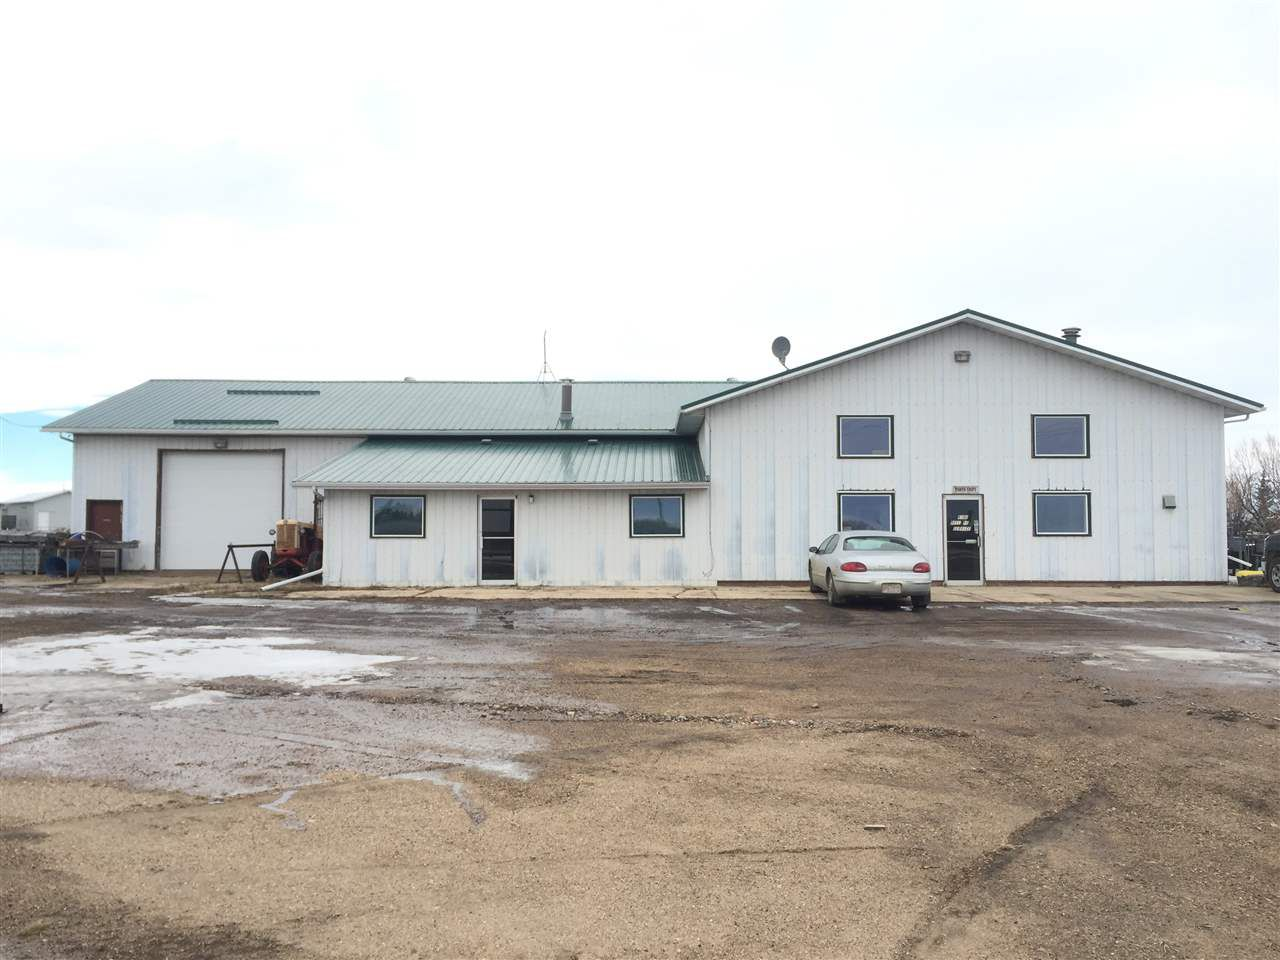 Main Photo: 60002 Range Road 252: Rural Westlock County Industrial for sale : MLS®# E4113588